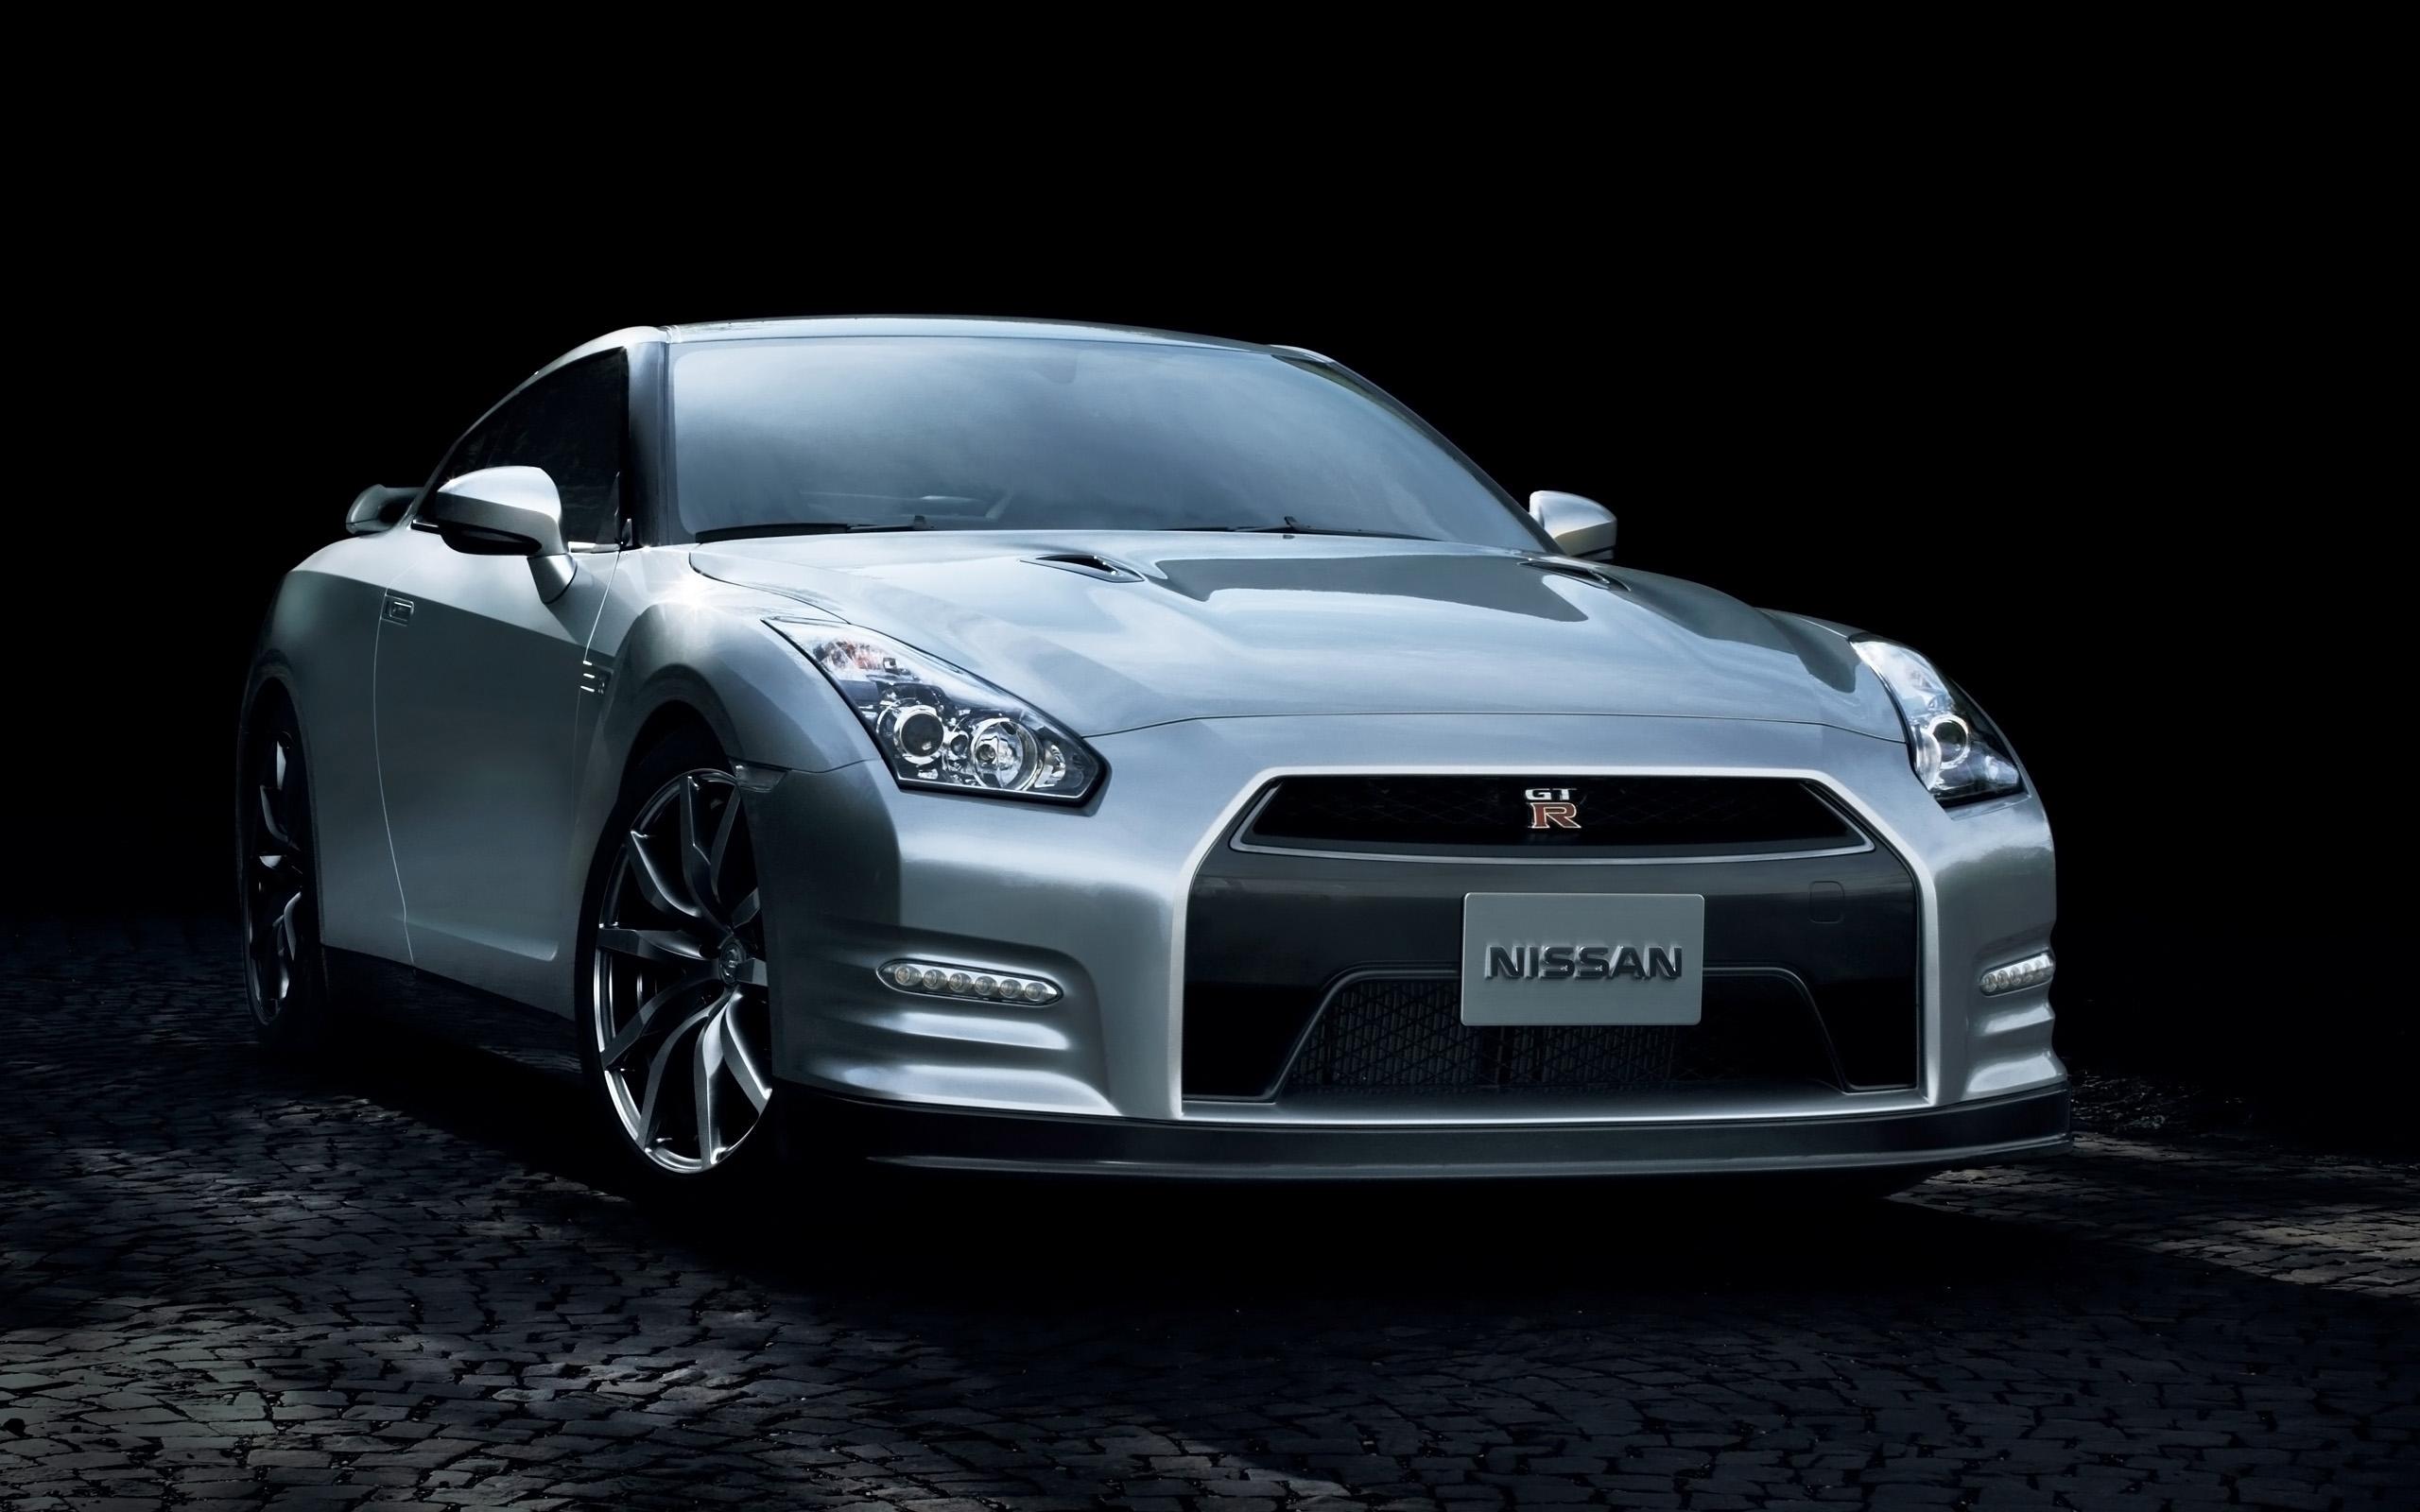 Nissan GT R 2014 Wallpaper HD Car Wallpapers 2560x1600